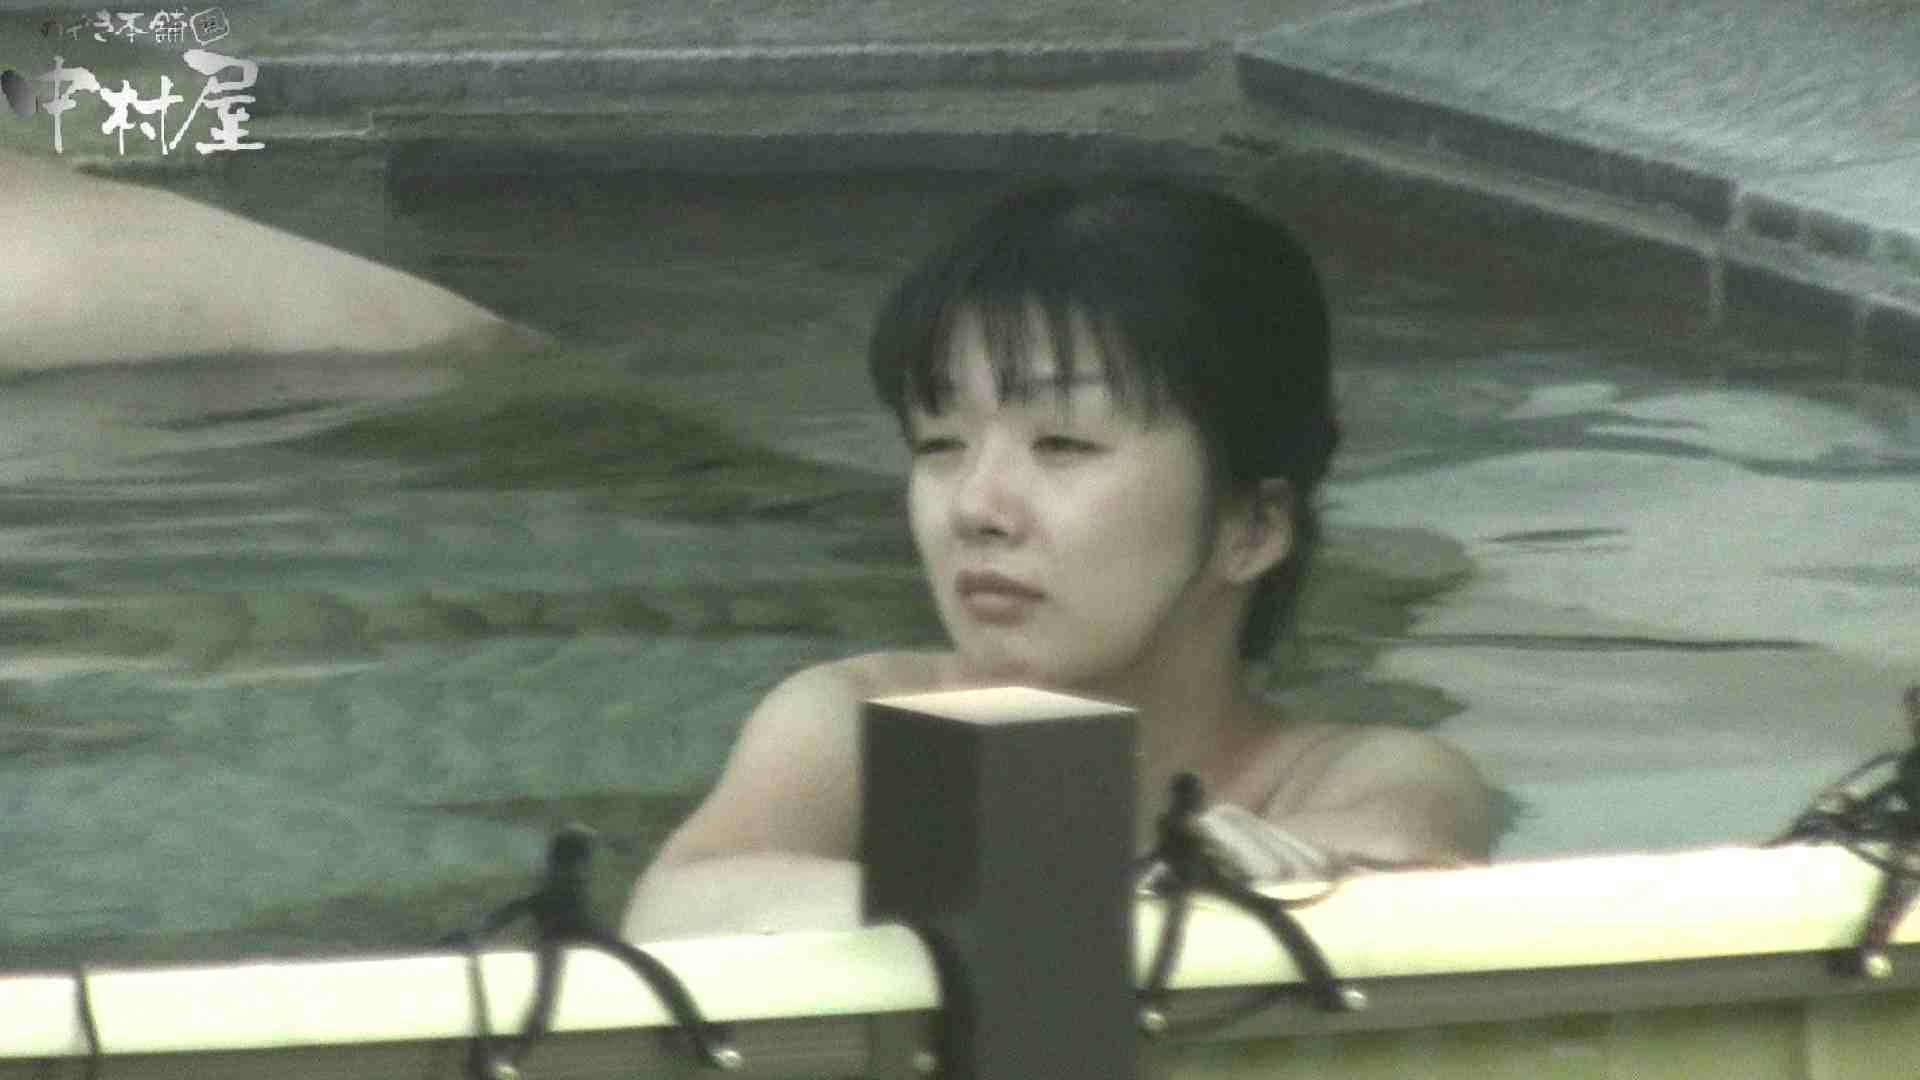 Aquaな露天風呂Vol.904 盗撮師作品 | 露天風呂突入  103pic 43